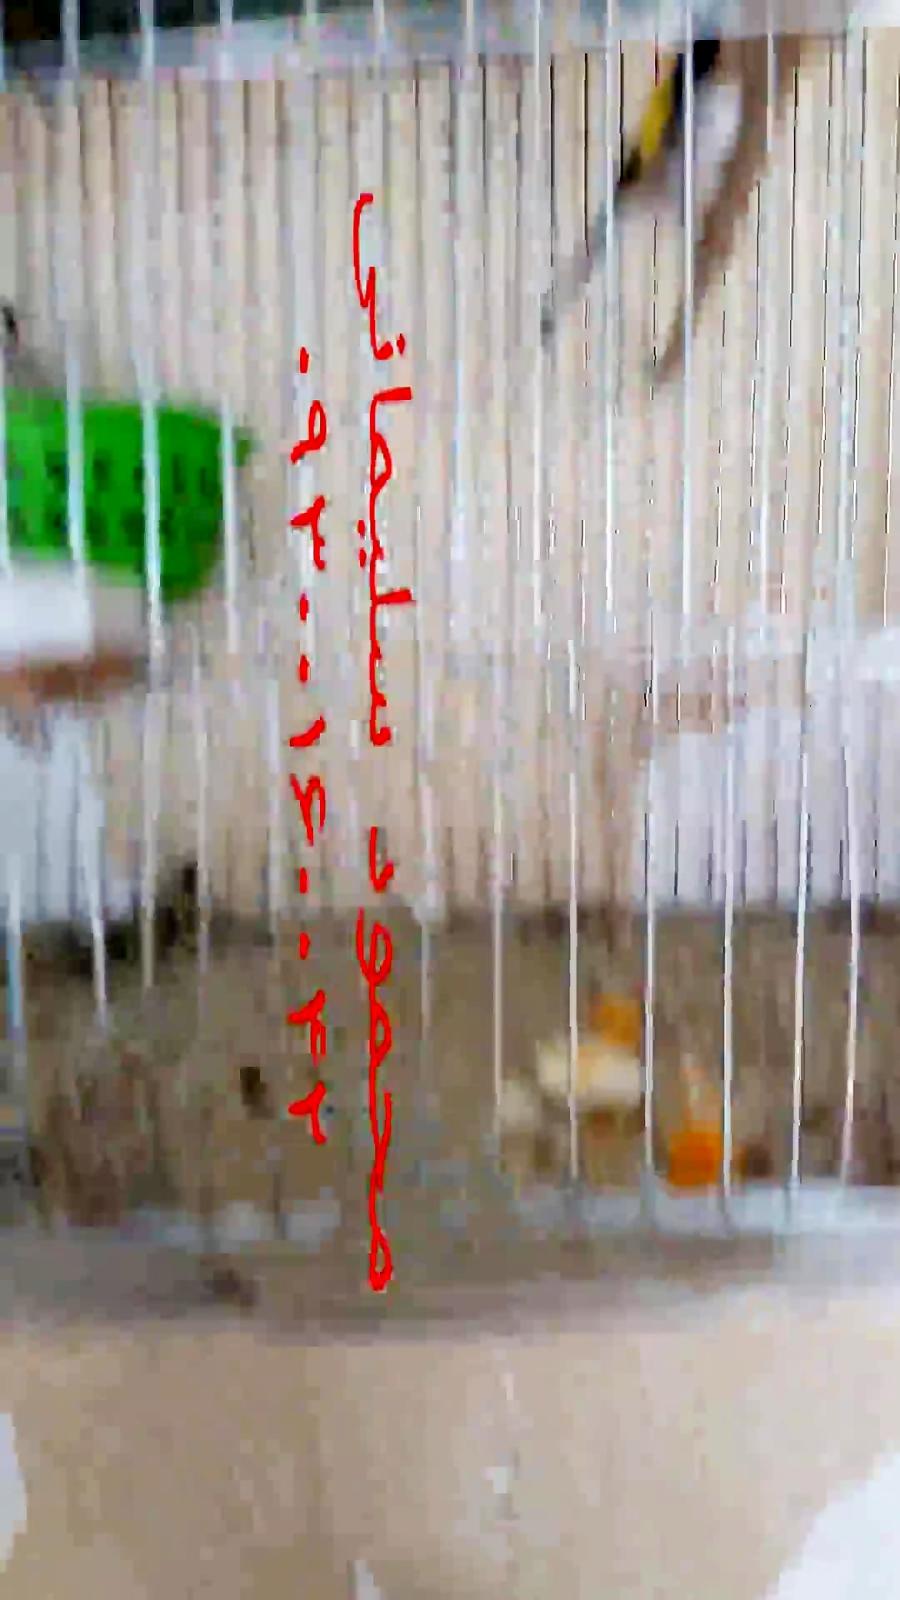 9354e5196 فیلم: تکثیر سهره در قفس / ویدیو کلیپ | پرشین ناز